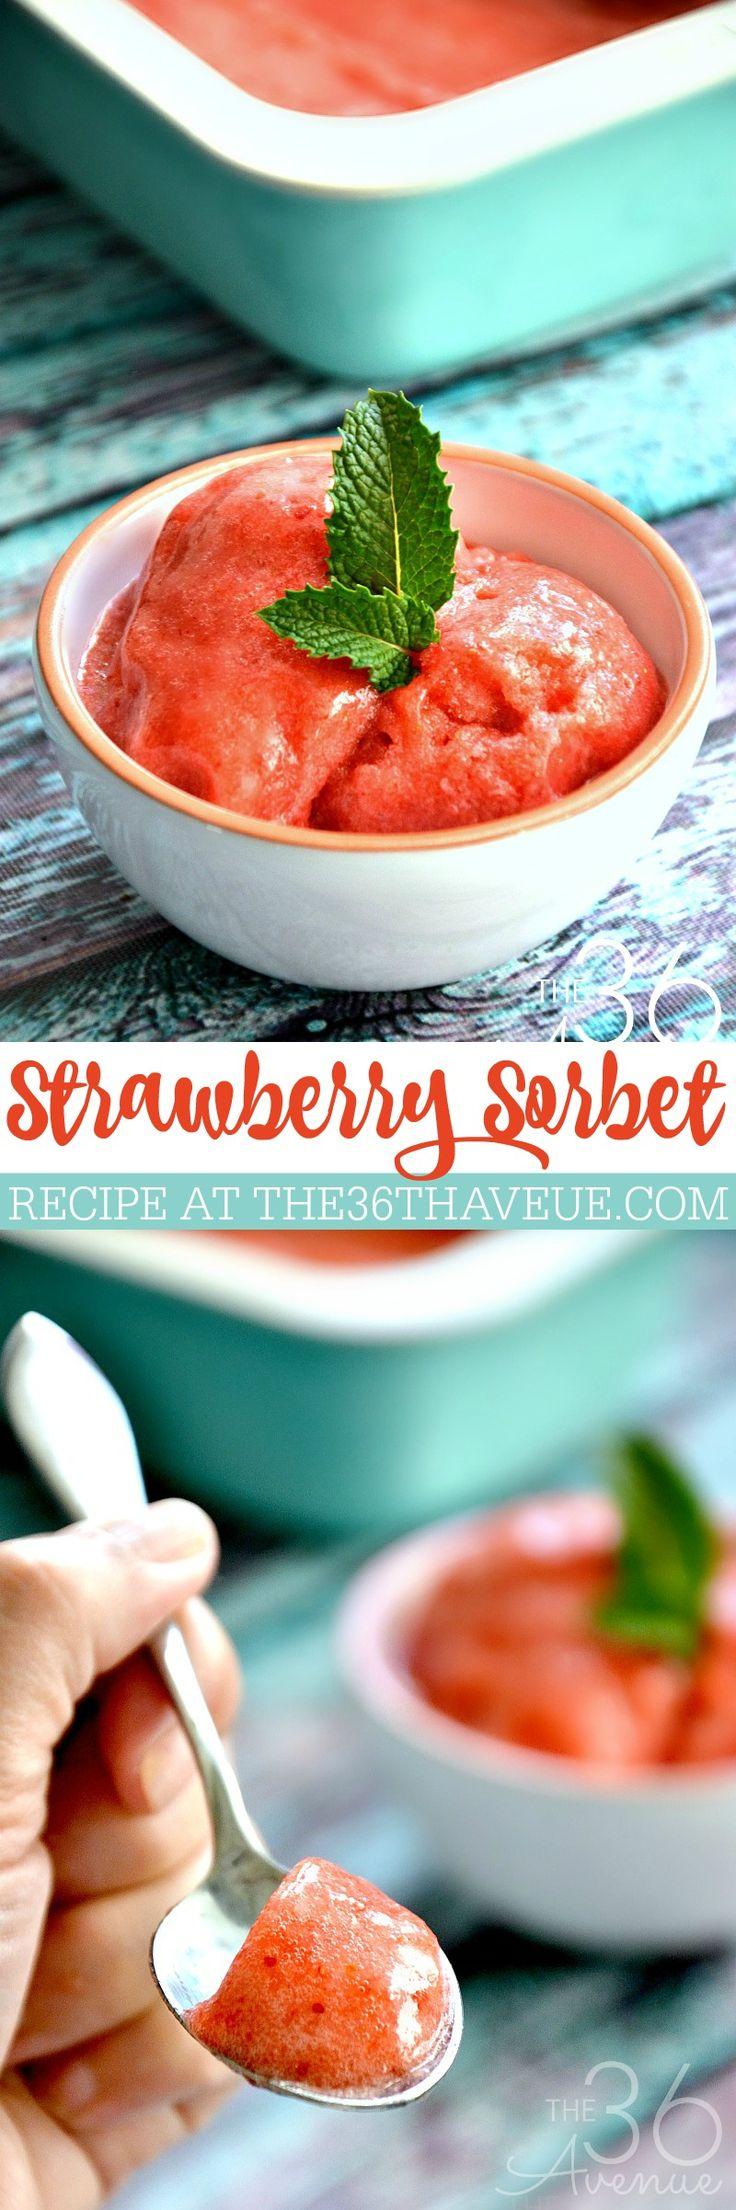 303 best Recipes   Frozen Treats images on Pinterest   Frozen ...